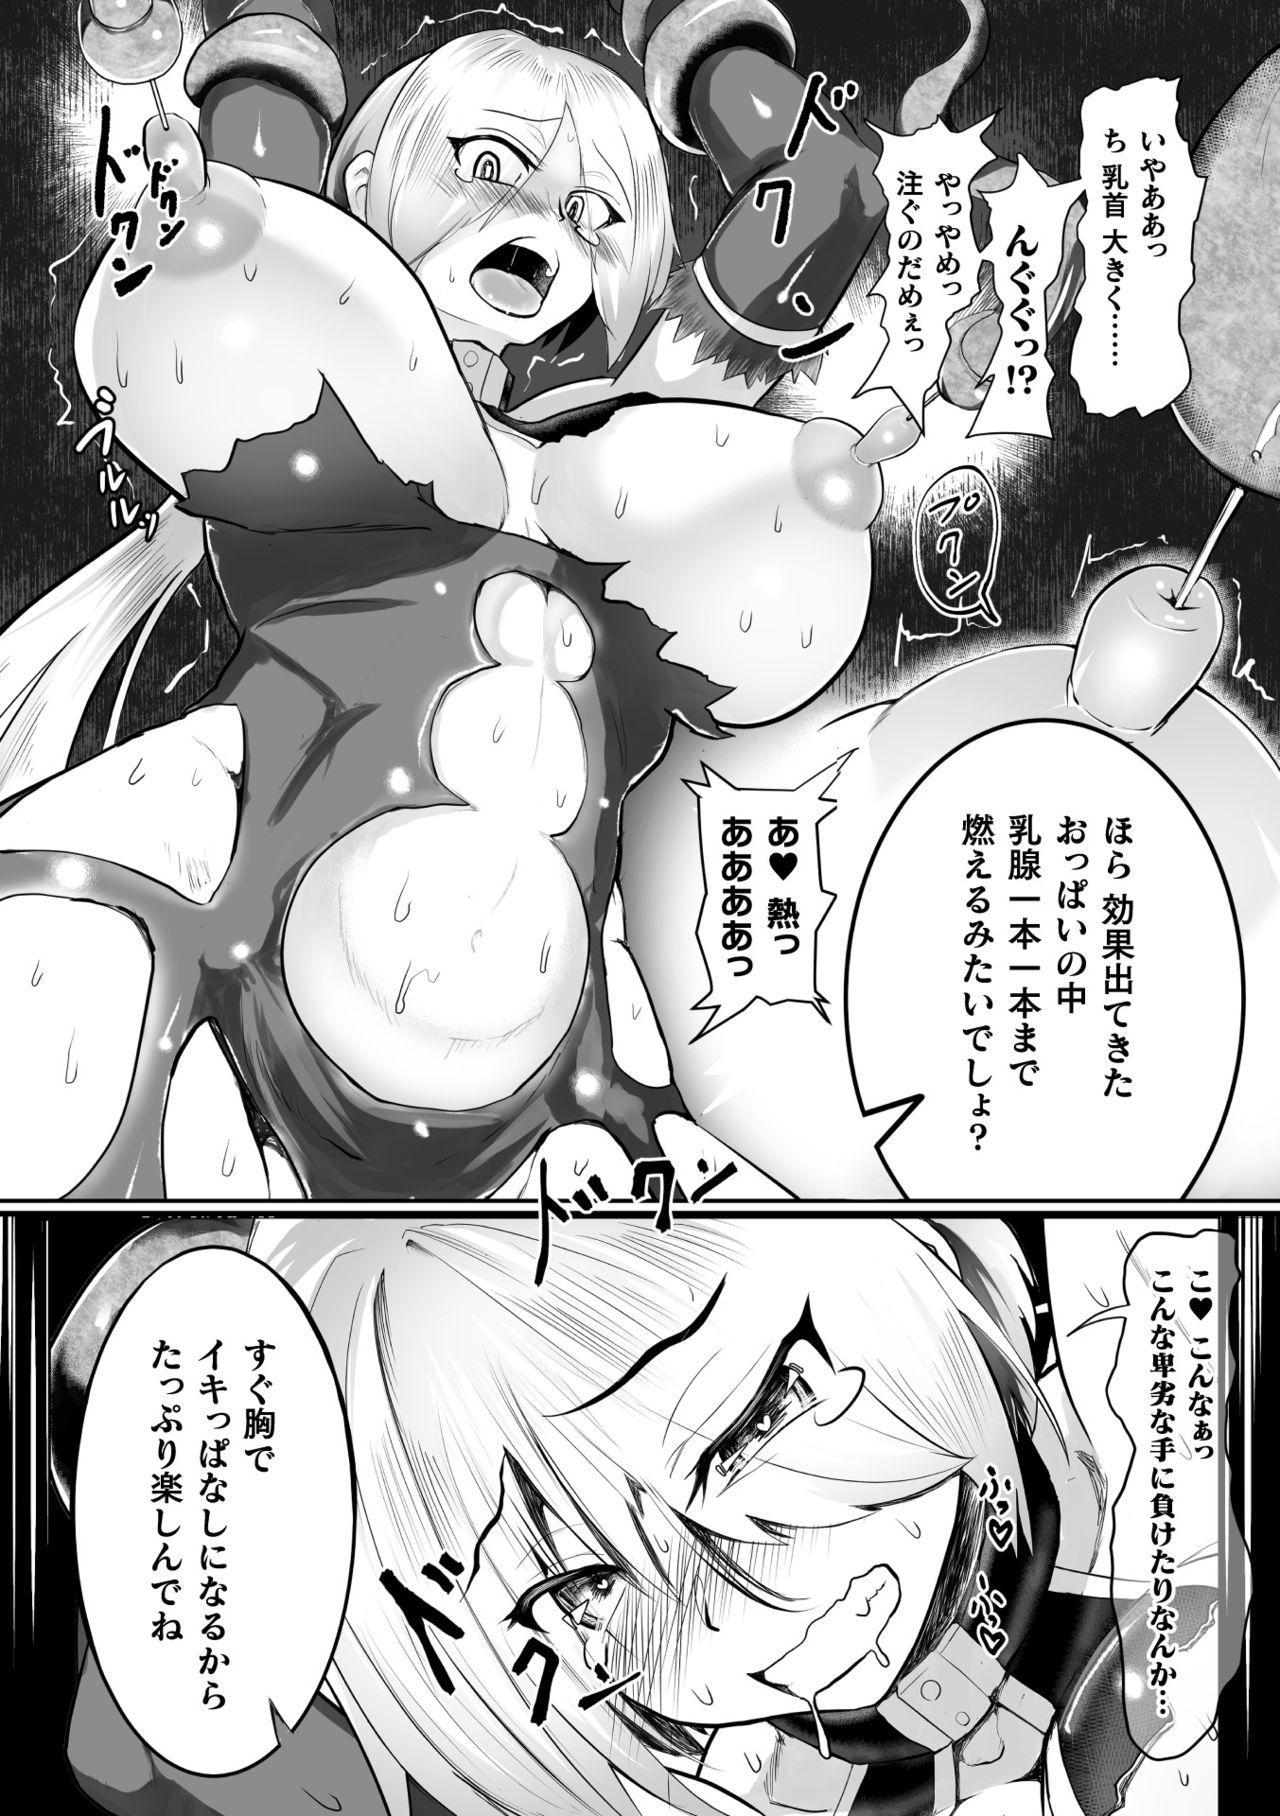 2D Comic Magazine Capsule Kan Seigi no Heroine Mesu Ochi Jikken! Vol. 2 53